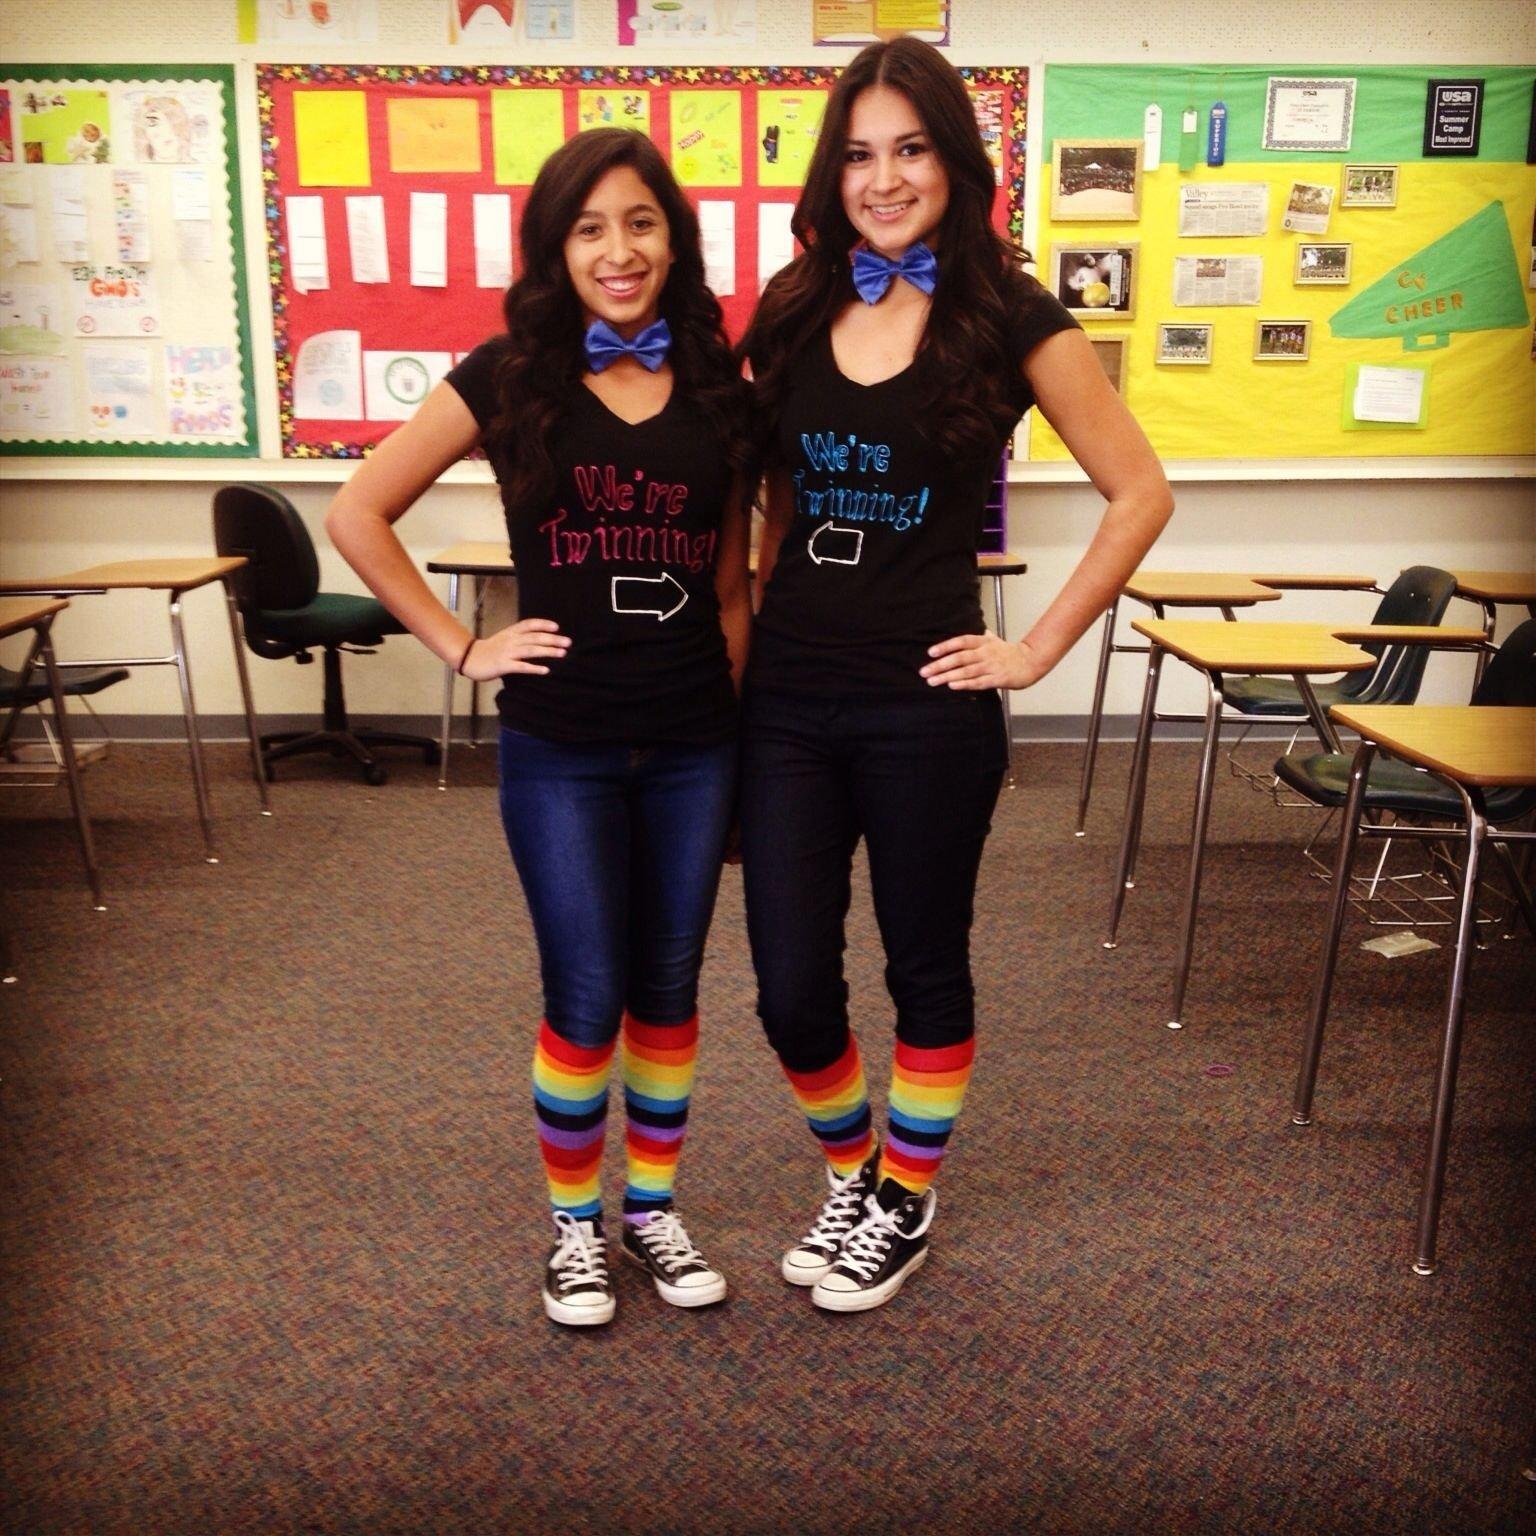 10 Perfect Twin Day Ideas For Spirit Week twin day spirit week at school my lifee29da4 pinterest twins 14 2021